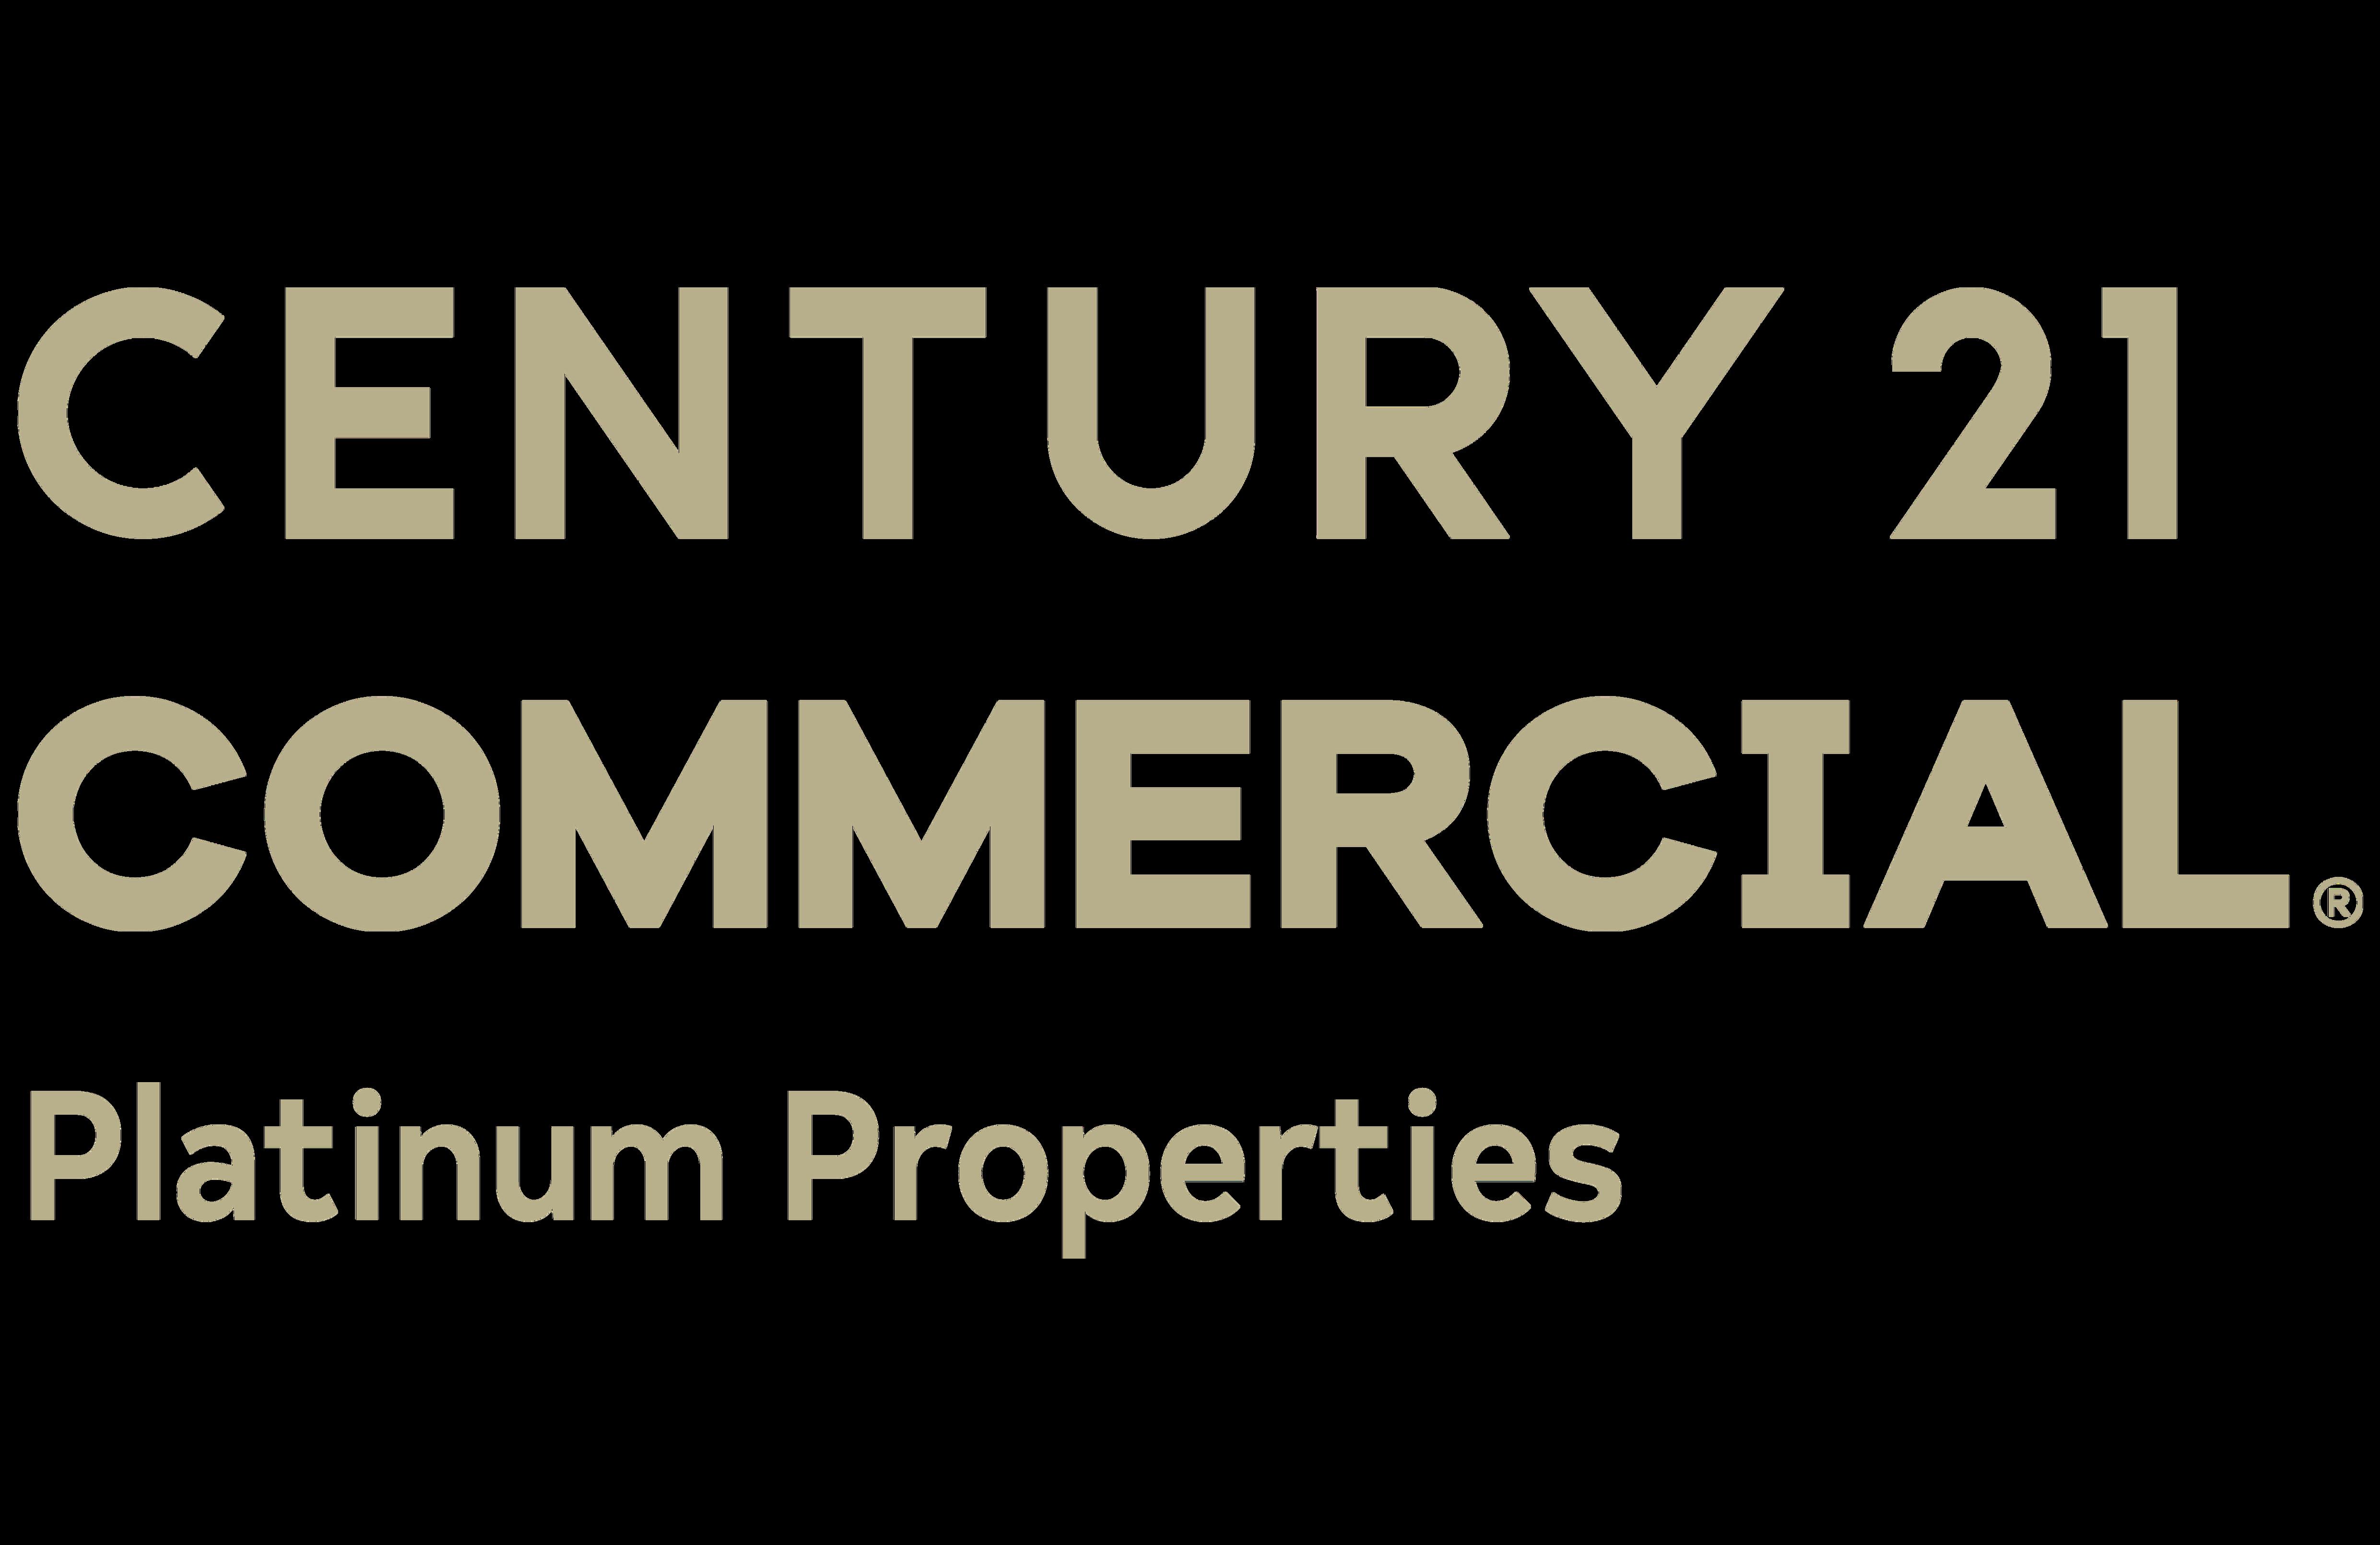 CENTURY 21 Platinum Properties